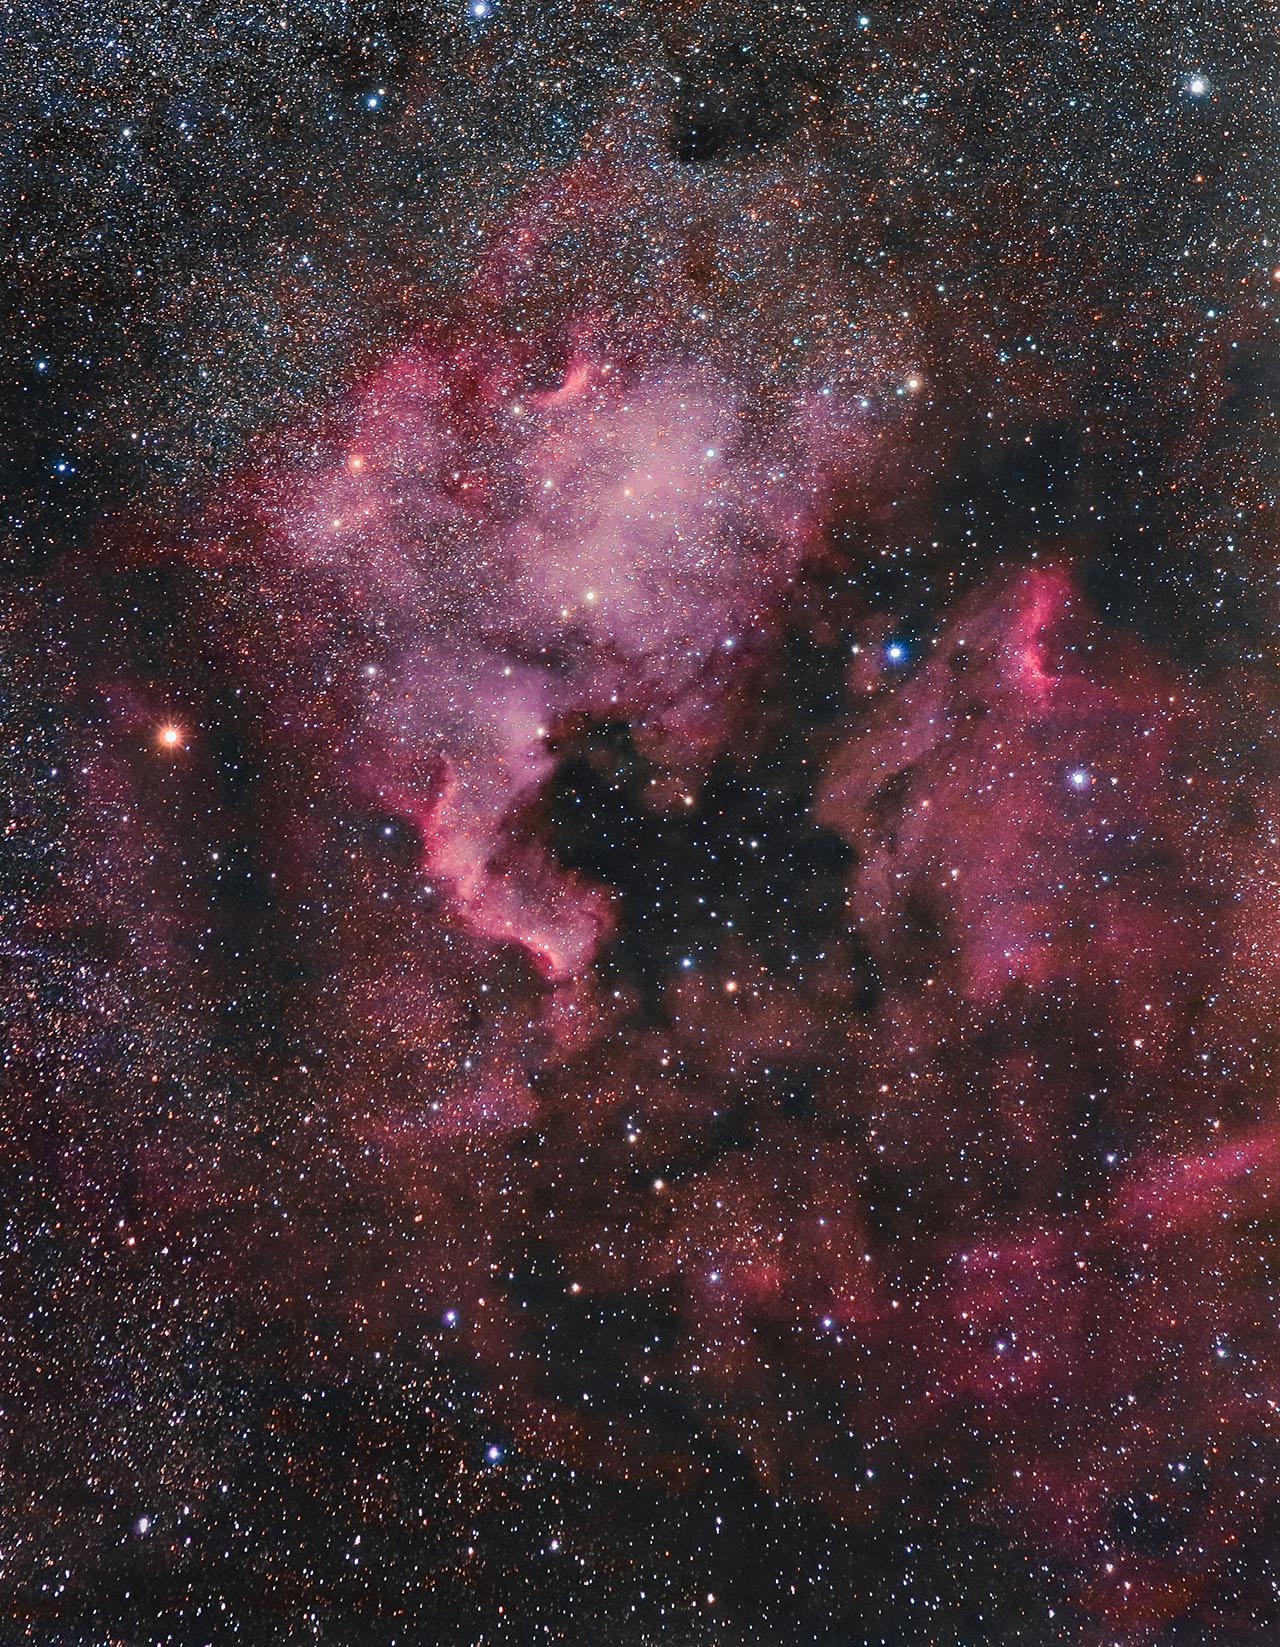 The North America Nebula by Captain-Marmote